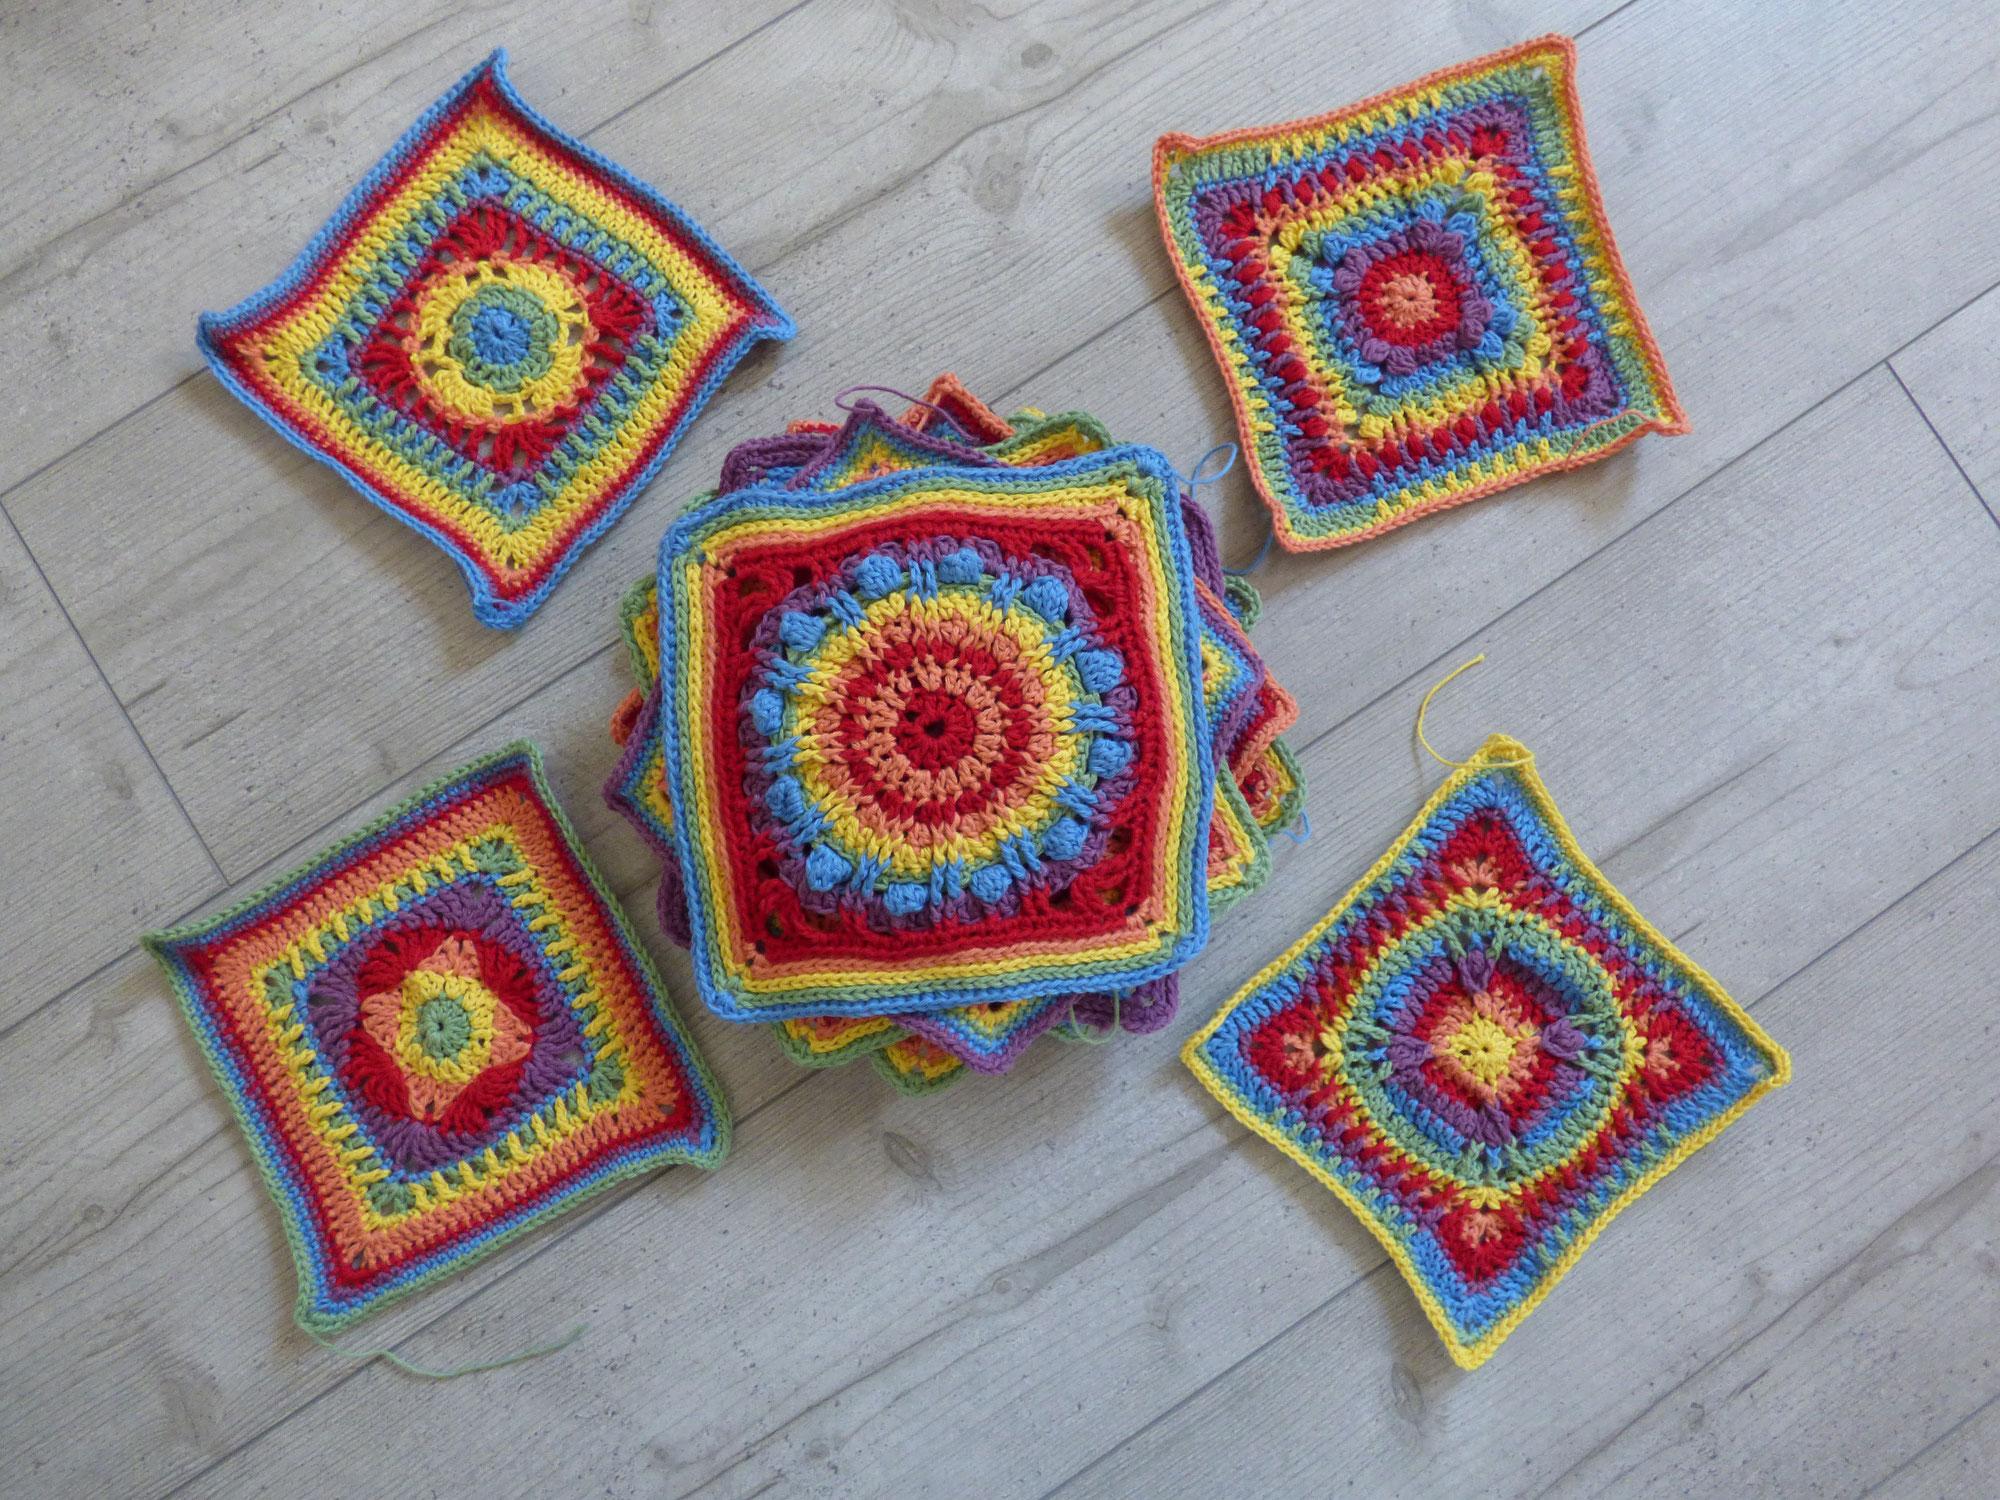 Der Stapel an Häkelquadraten wächst und wächst - Zwischenstand beim Crochet A Block Crochet Along 2021